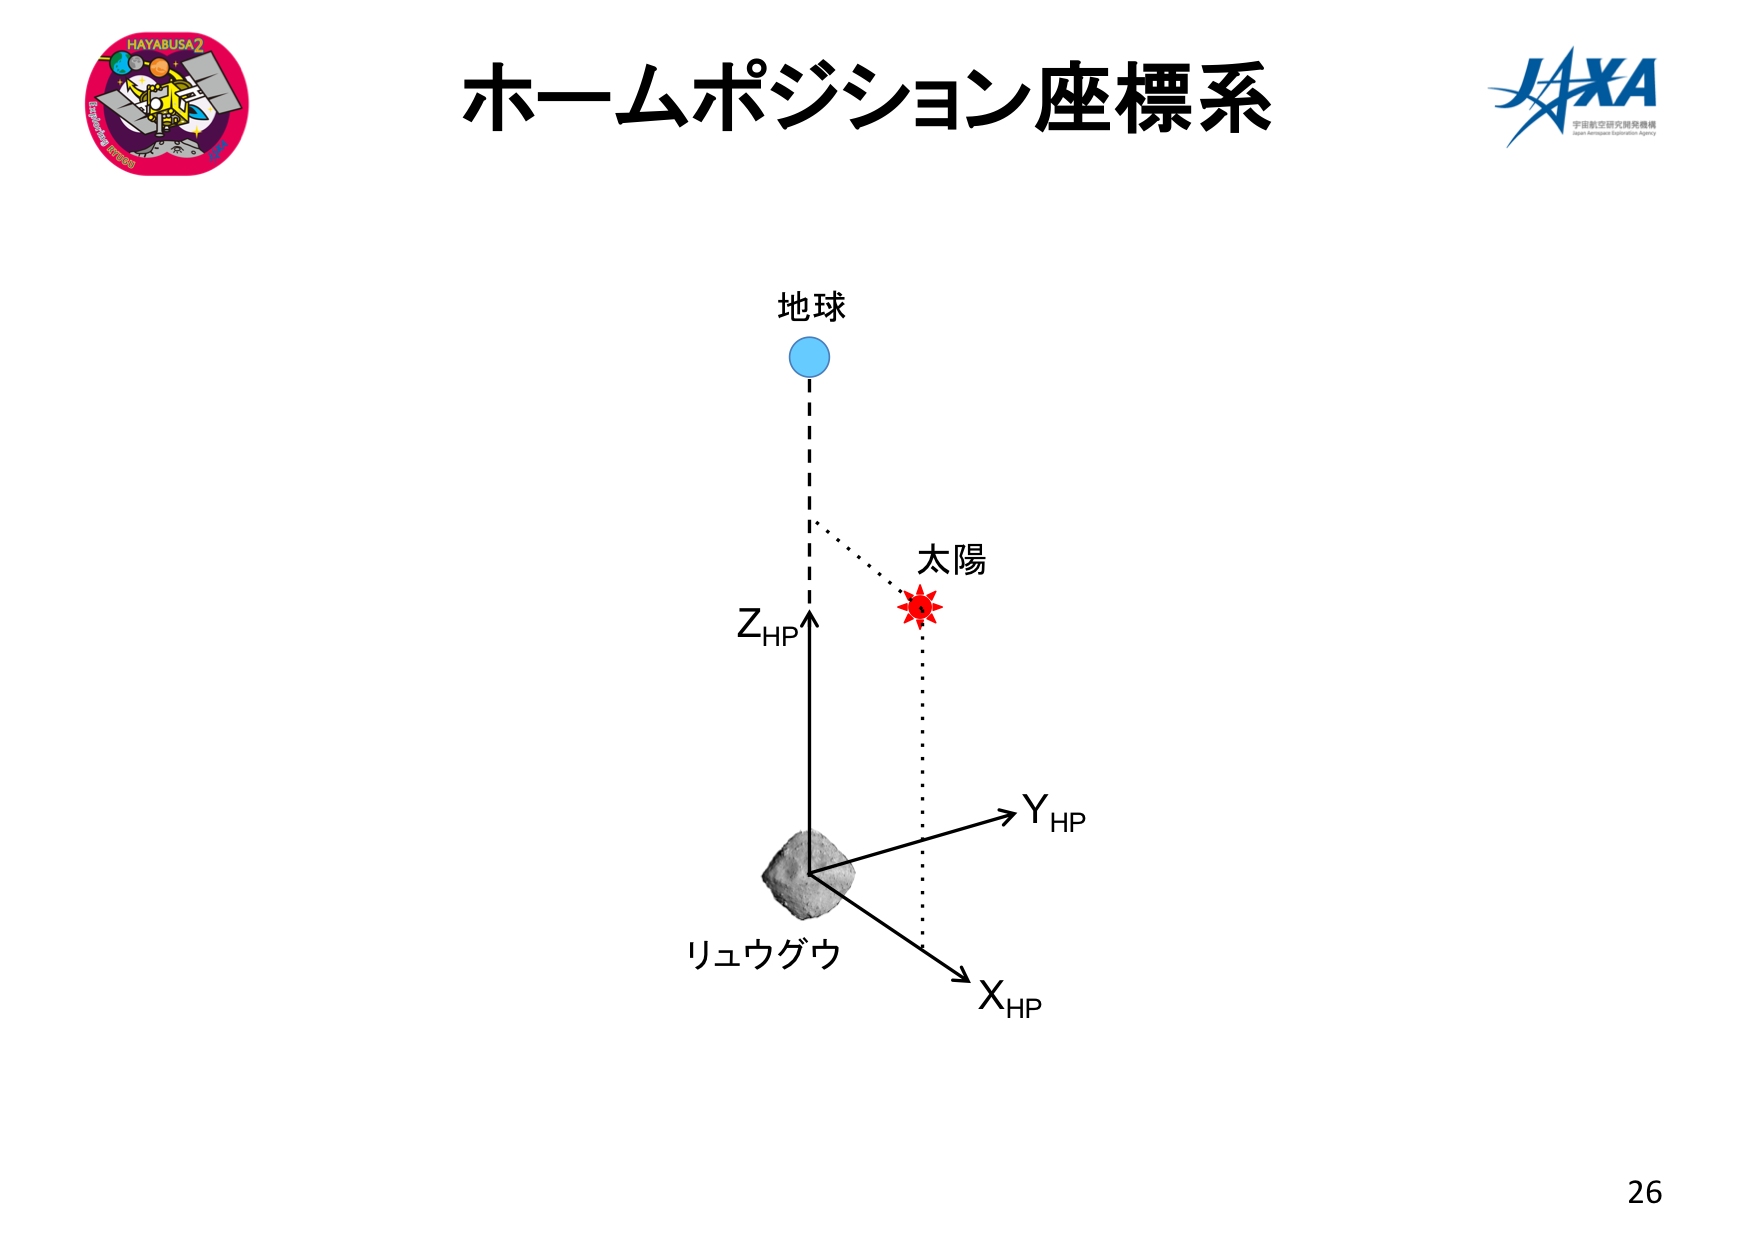 f:id:Imamura:20180905231958p:plain